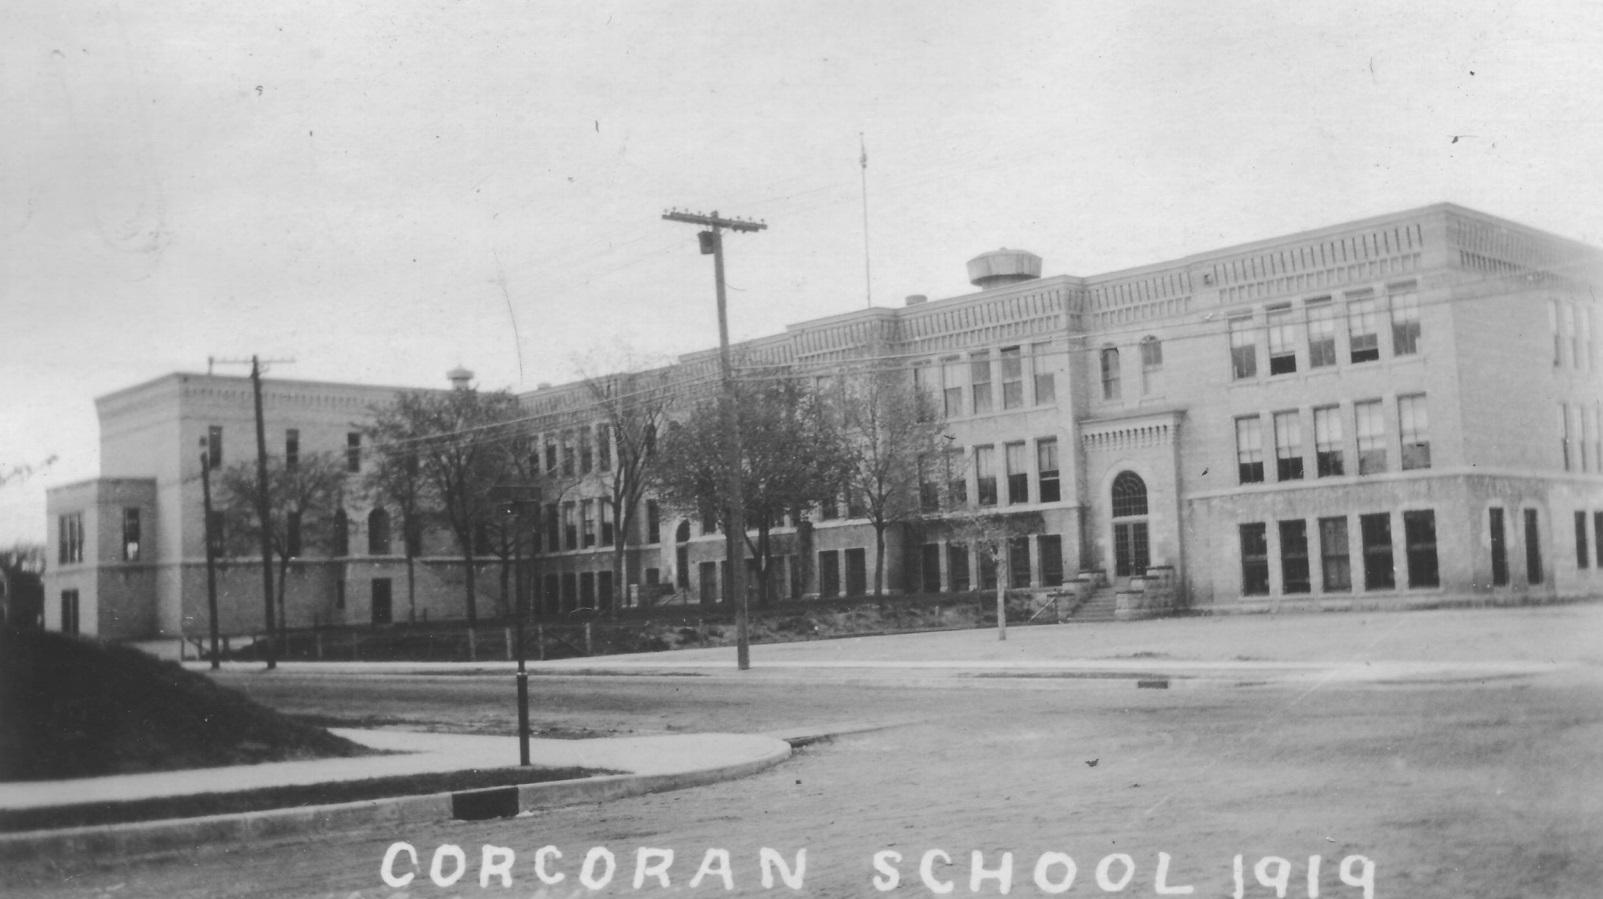 Corcoran_School_1919.jpg